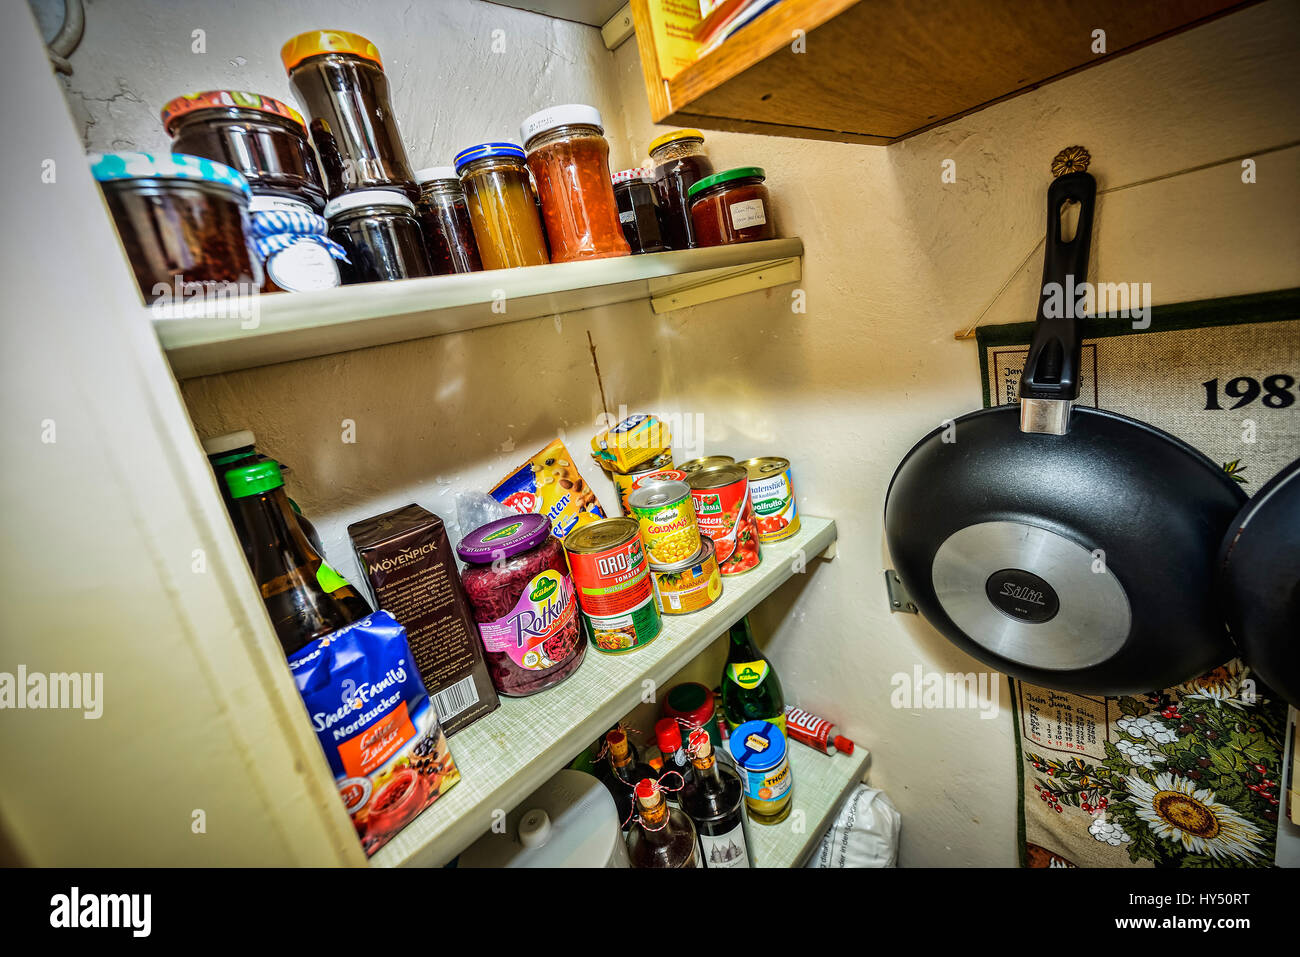 Pantry with canned food tins and bottling jars, Speisekammer mit Konservendosen und Einmachglaesern Stock Photo